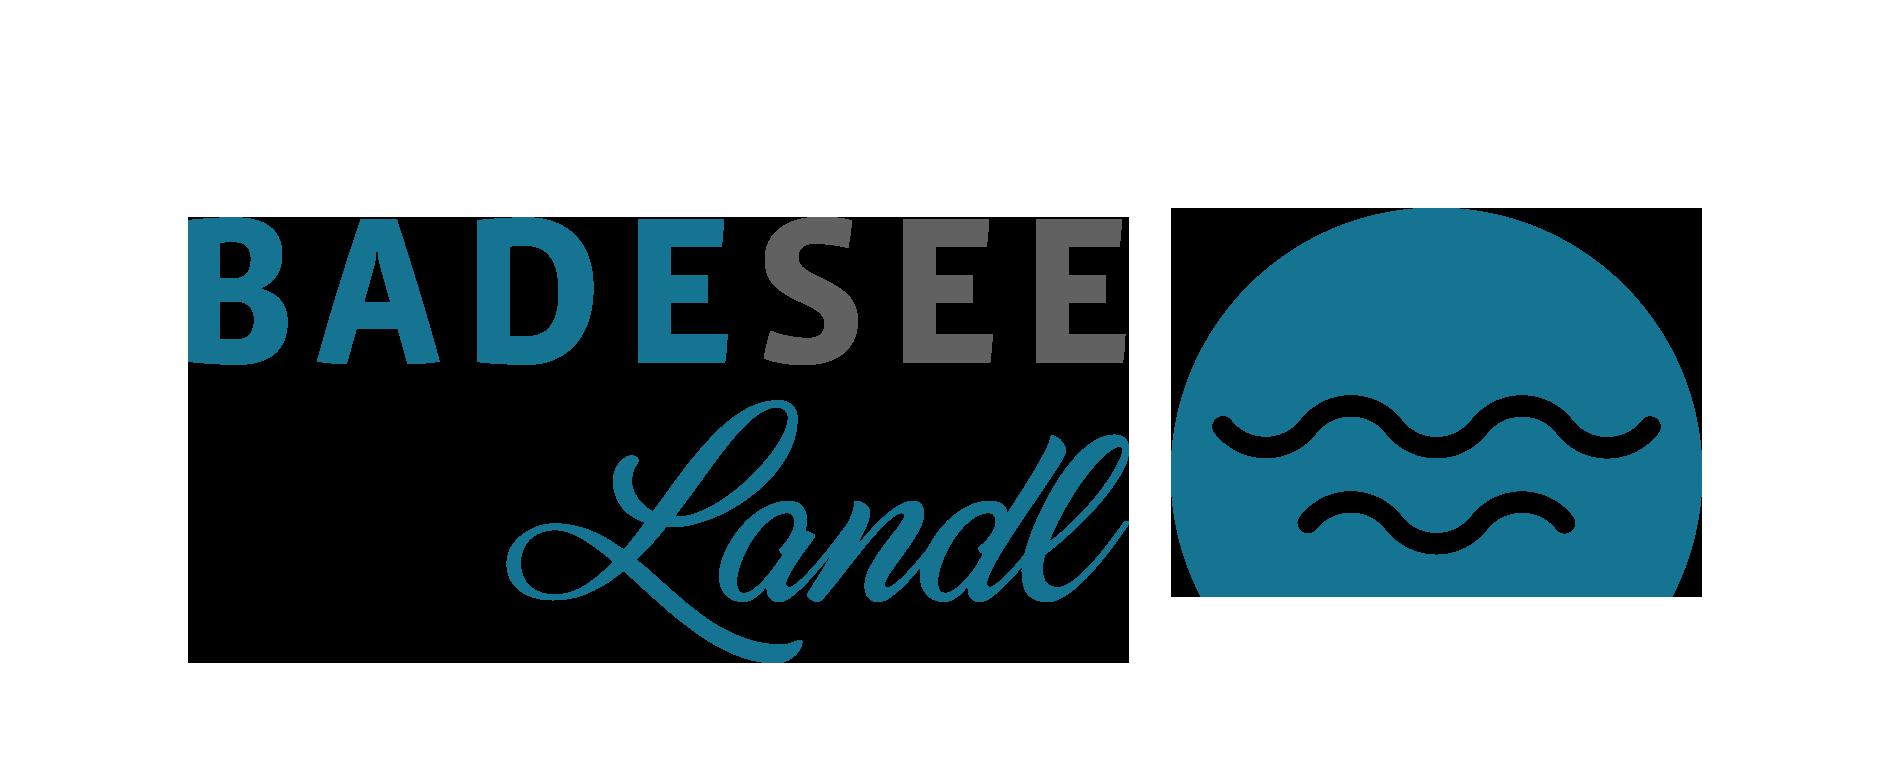 Badesee Landl